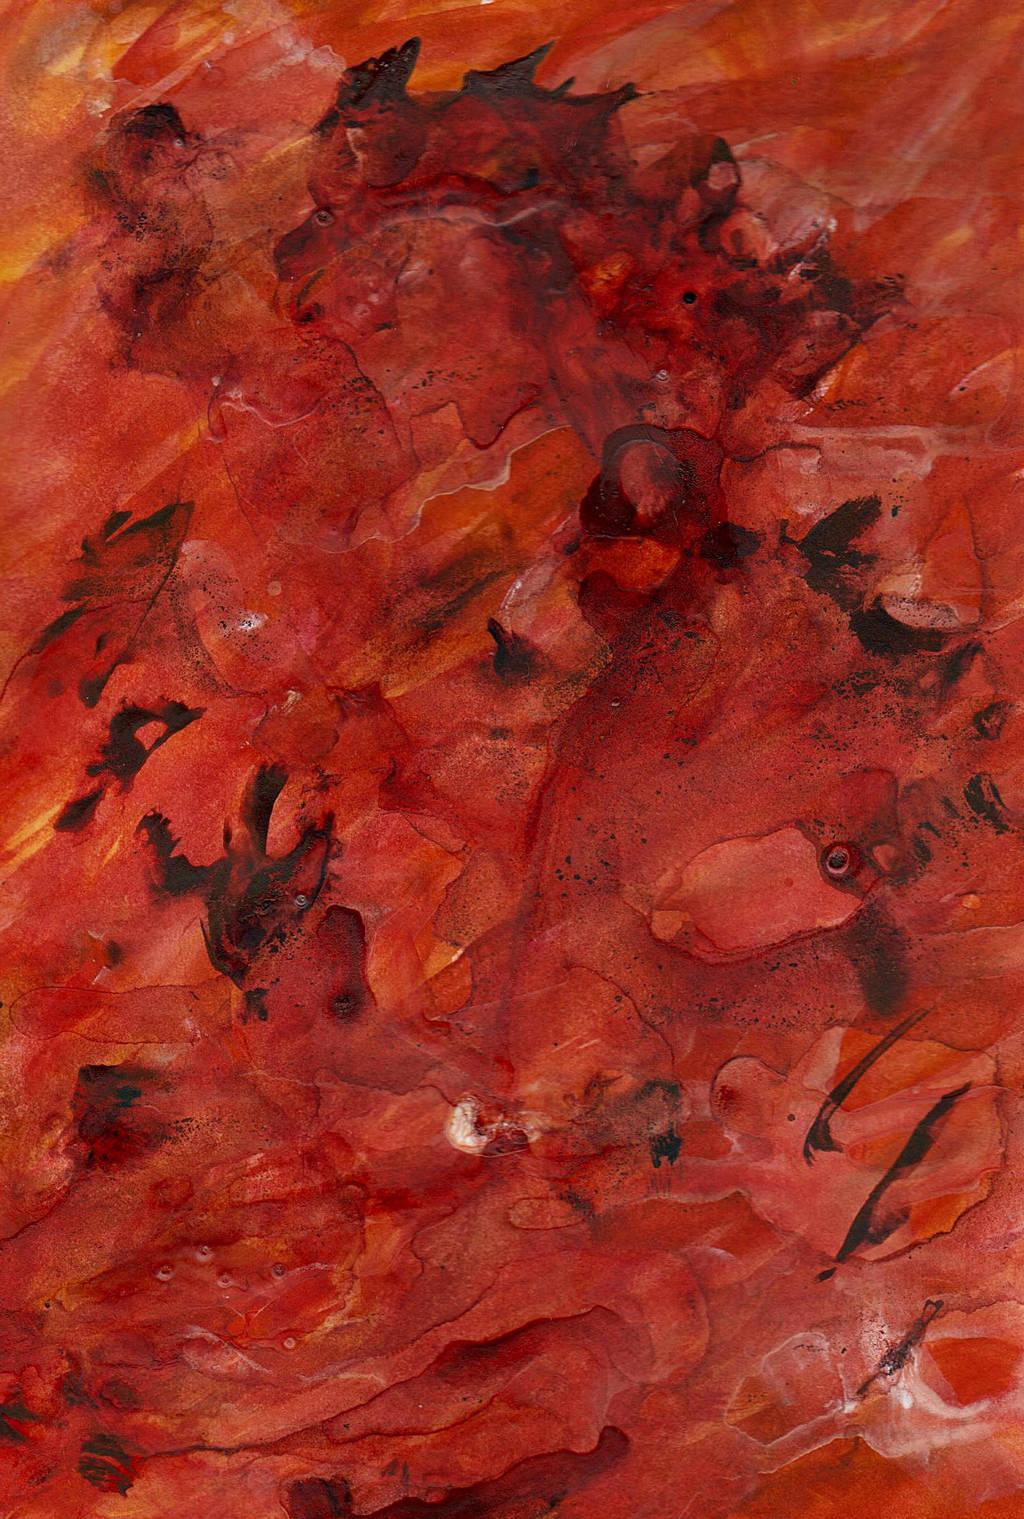 Red Dragon by crazyruthie